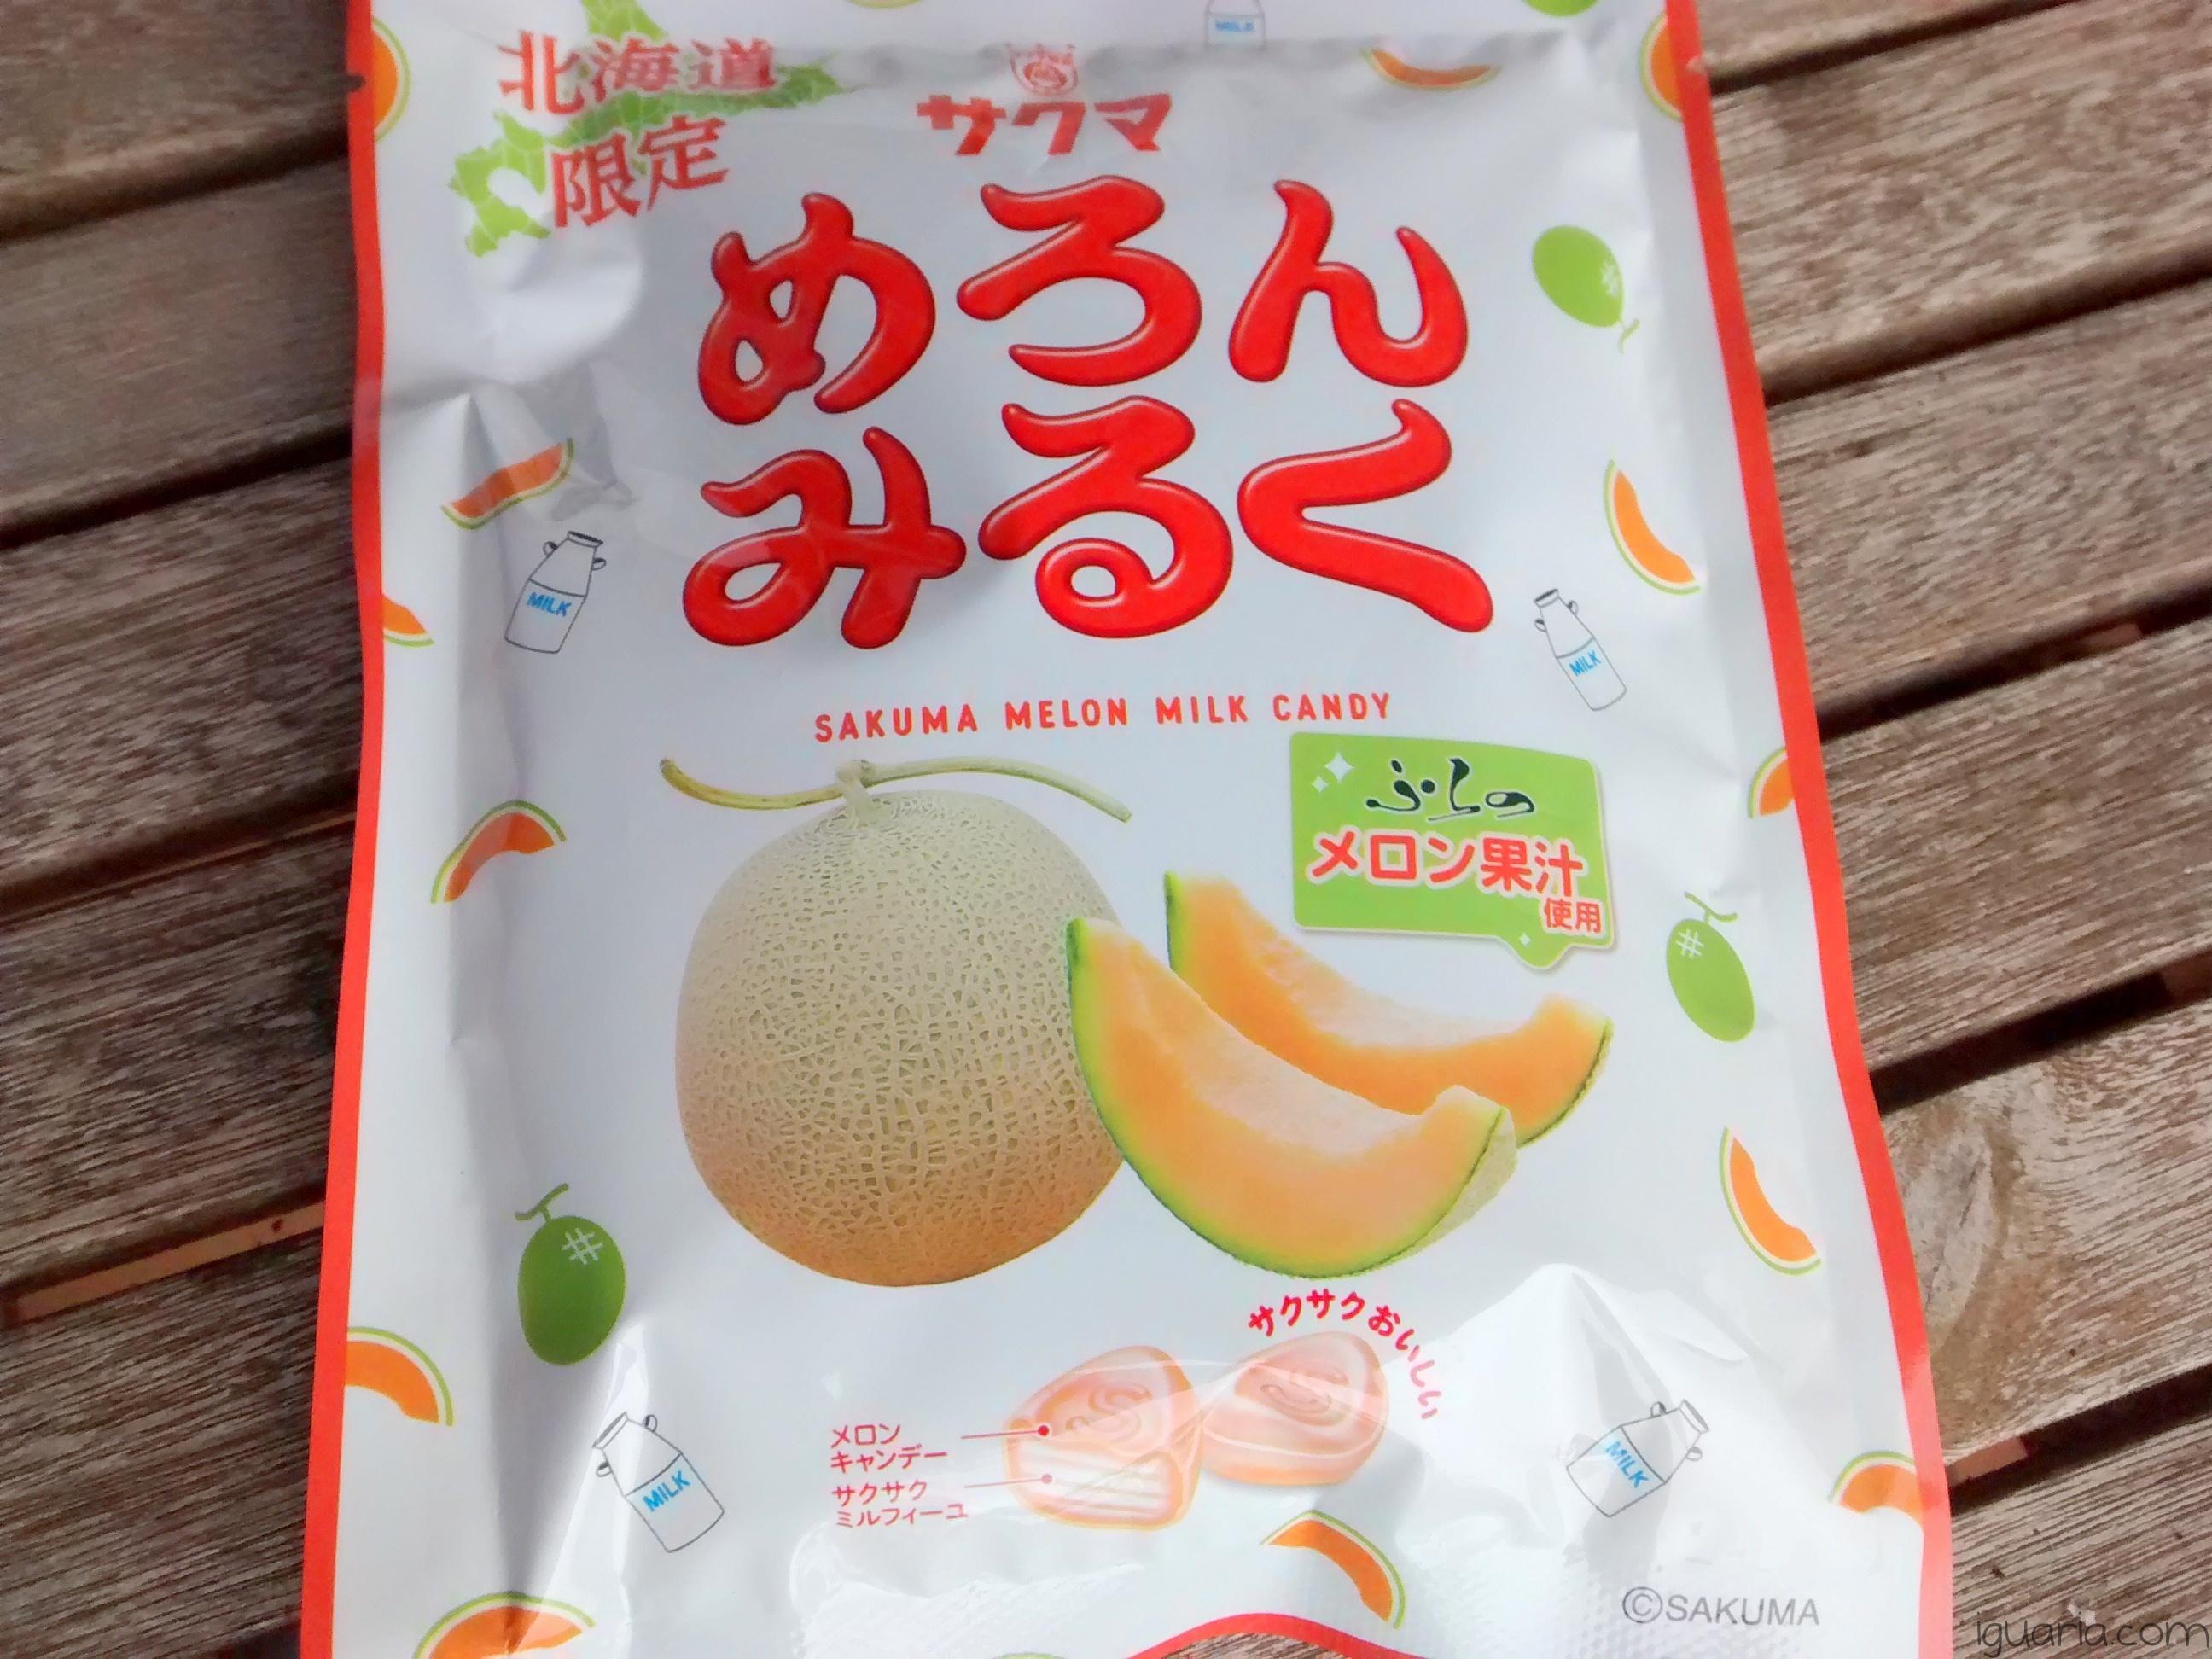 Iguaria_Sakuna-Melon-Milk-Candy